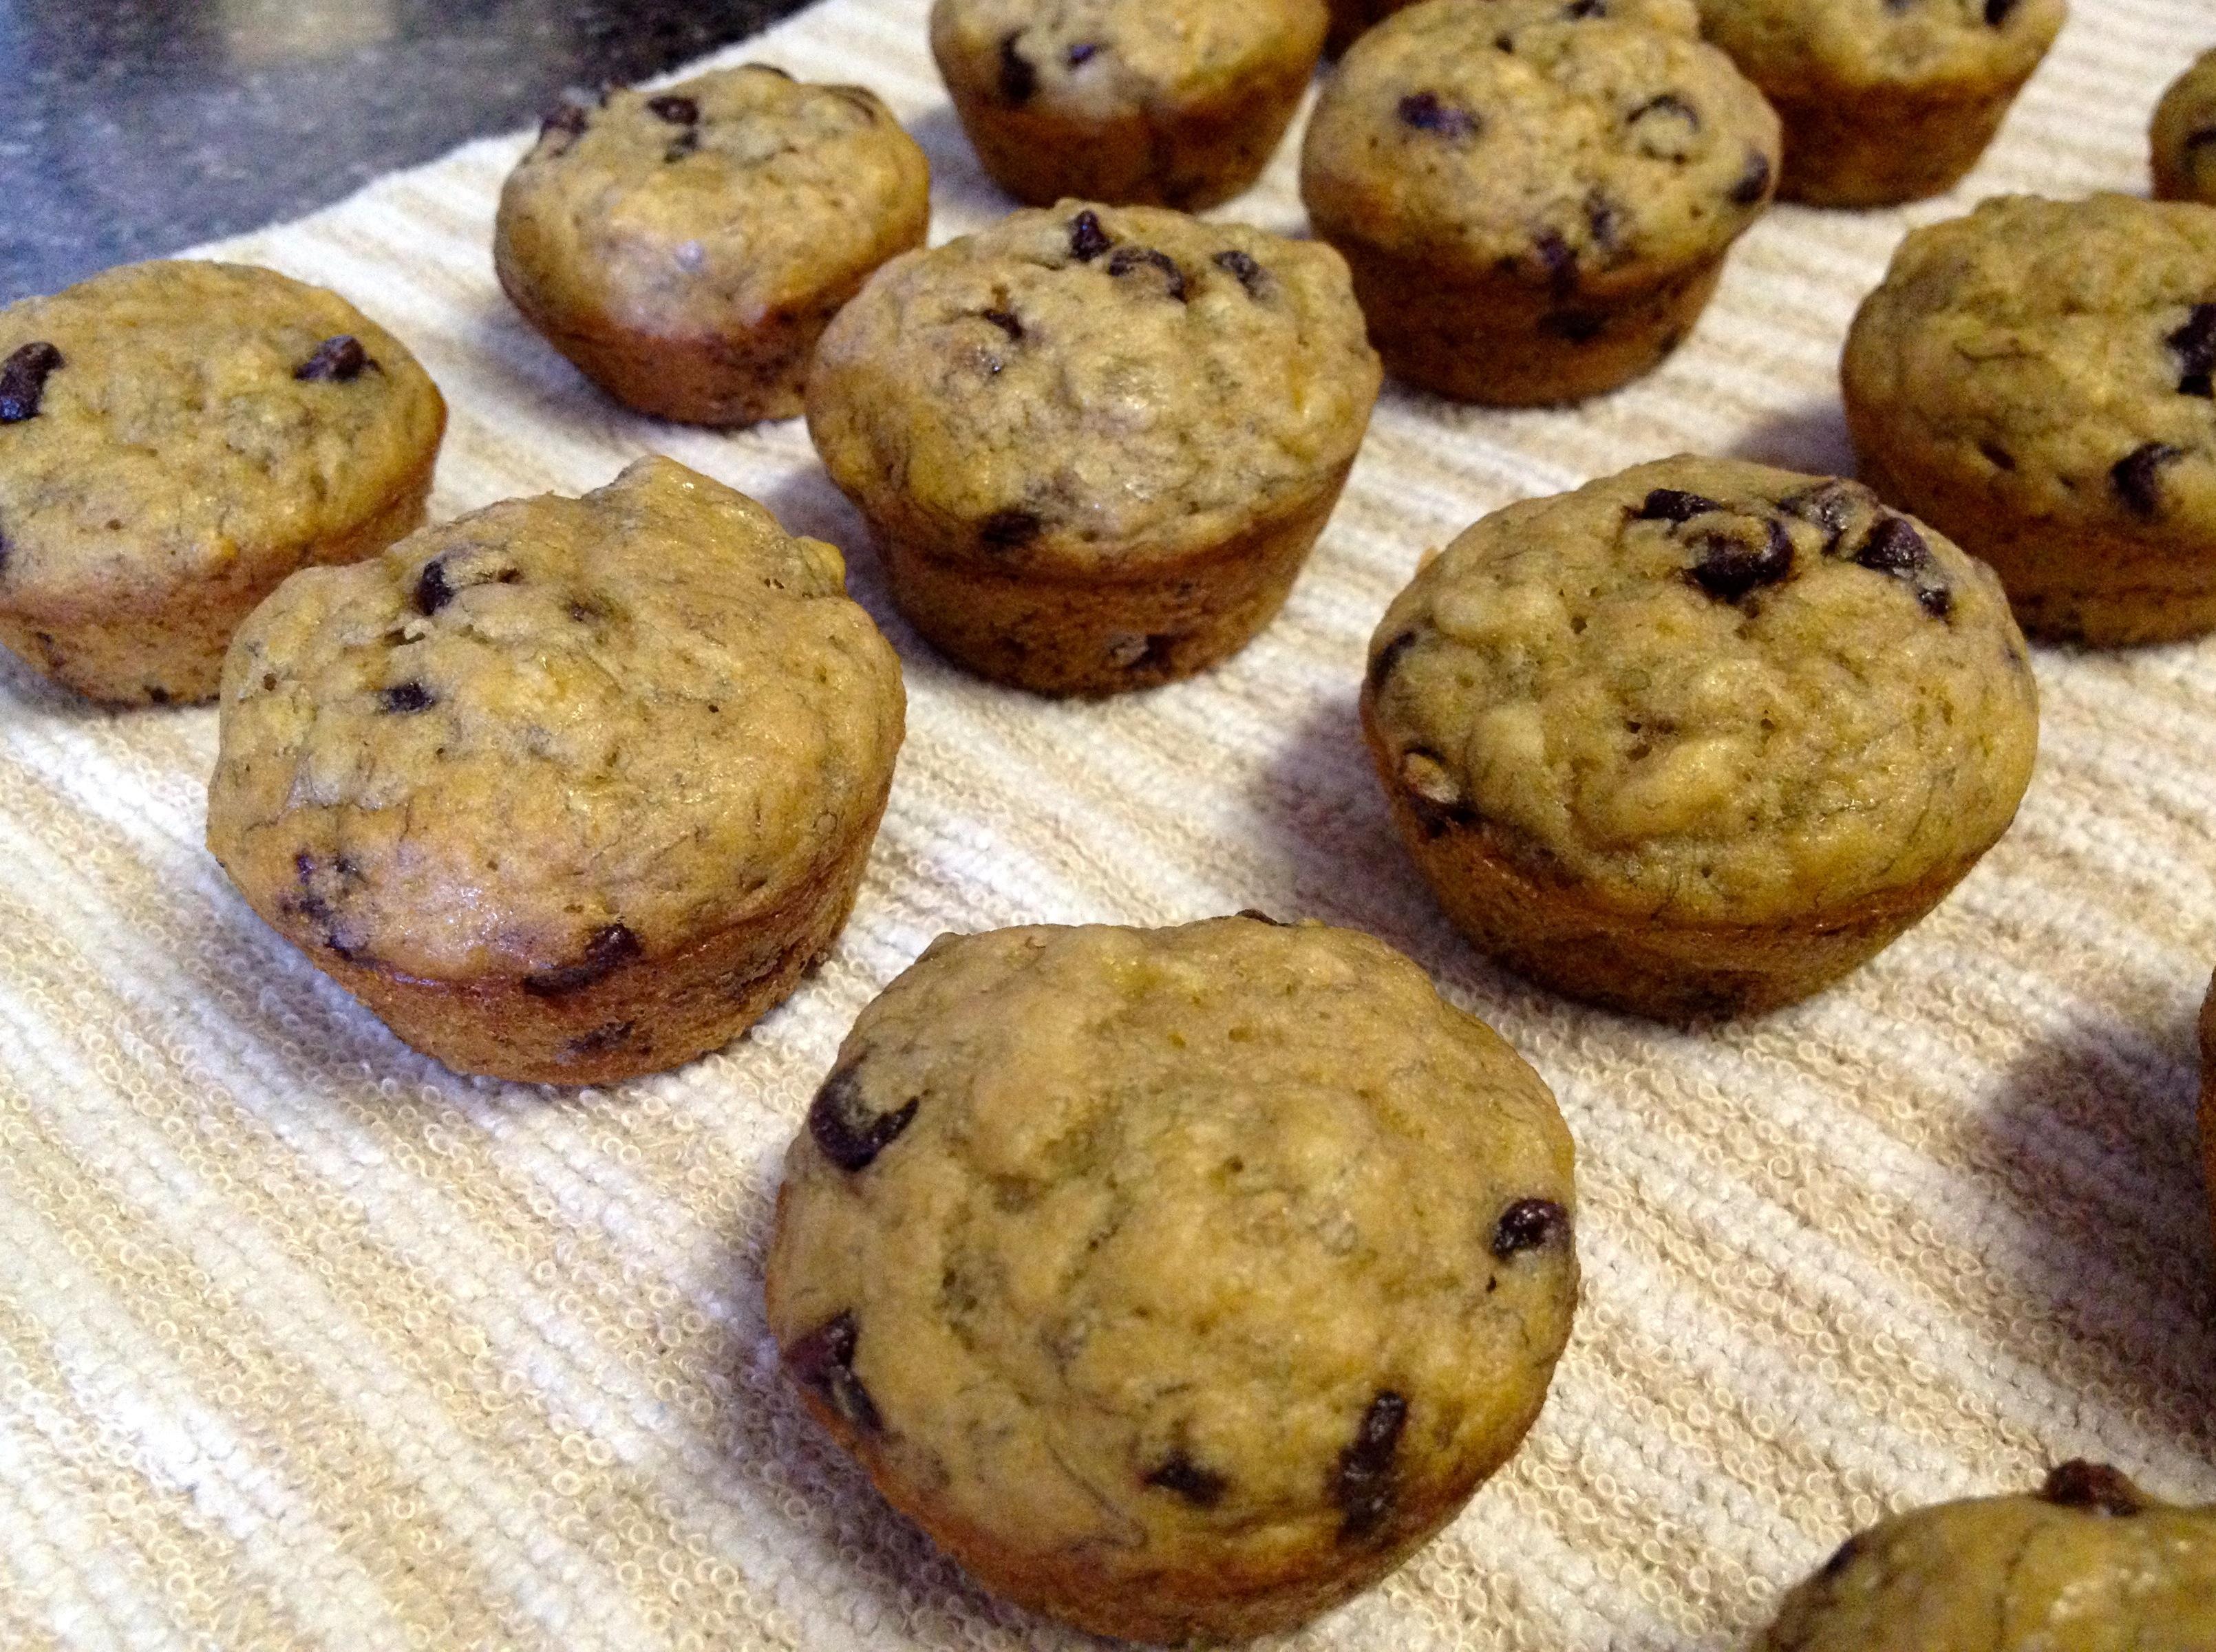 Banana mini muffins with chocolate chips